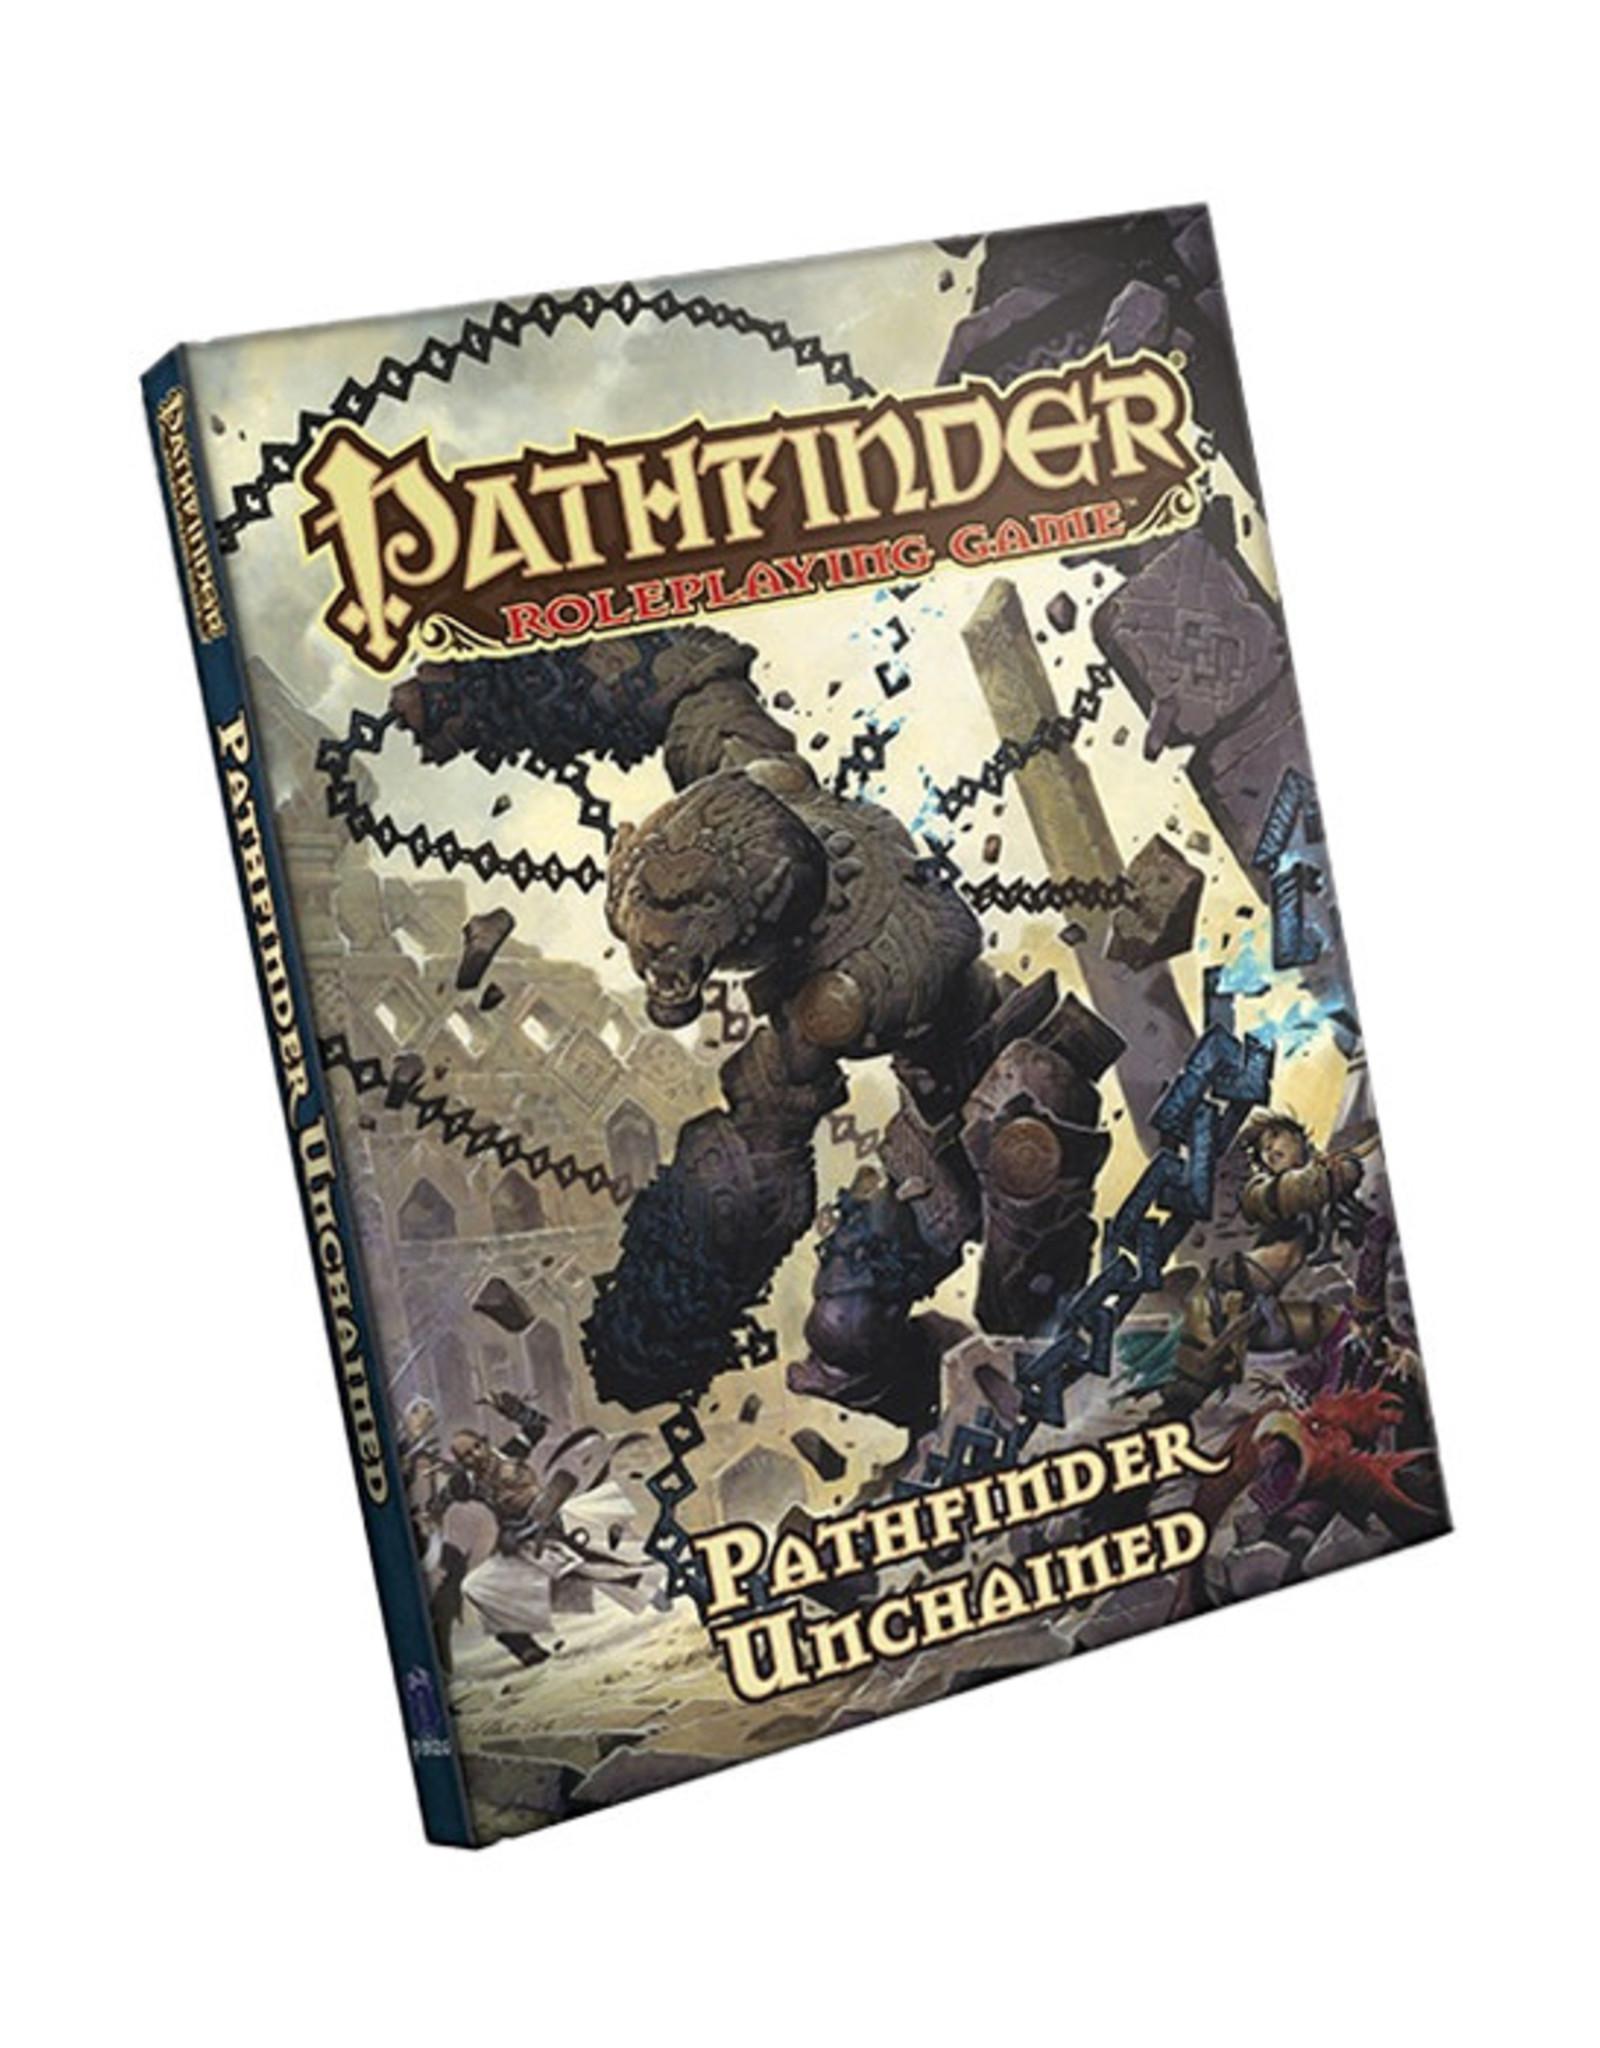 Pathfinder Pathfinder: Pathfinder Unchained